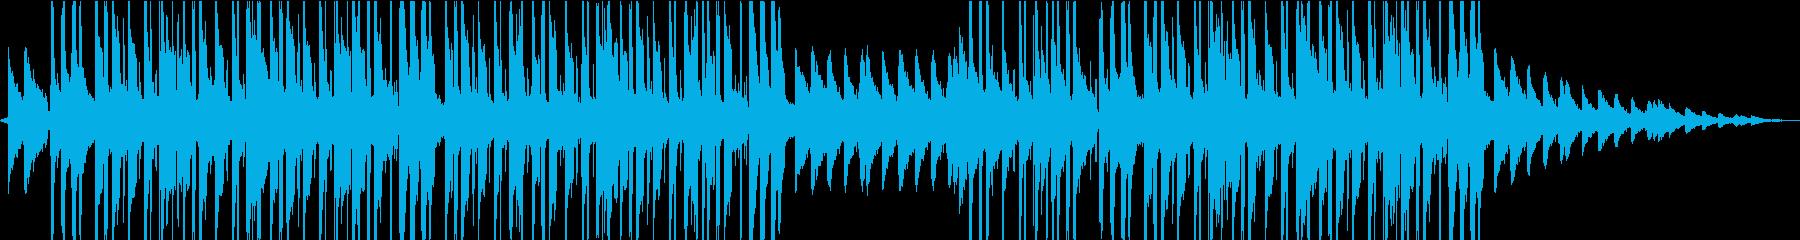 Low hip hop's reproduced waveform